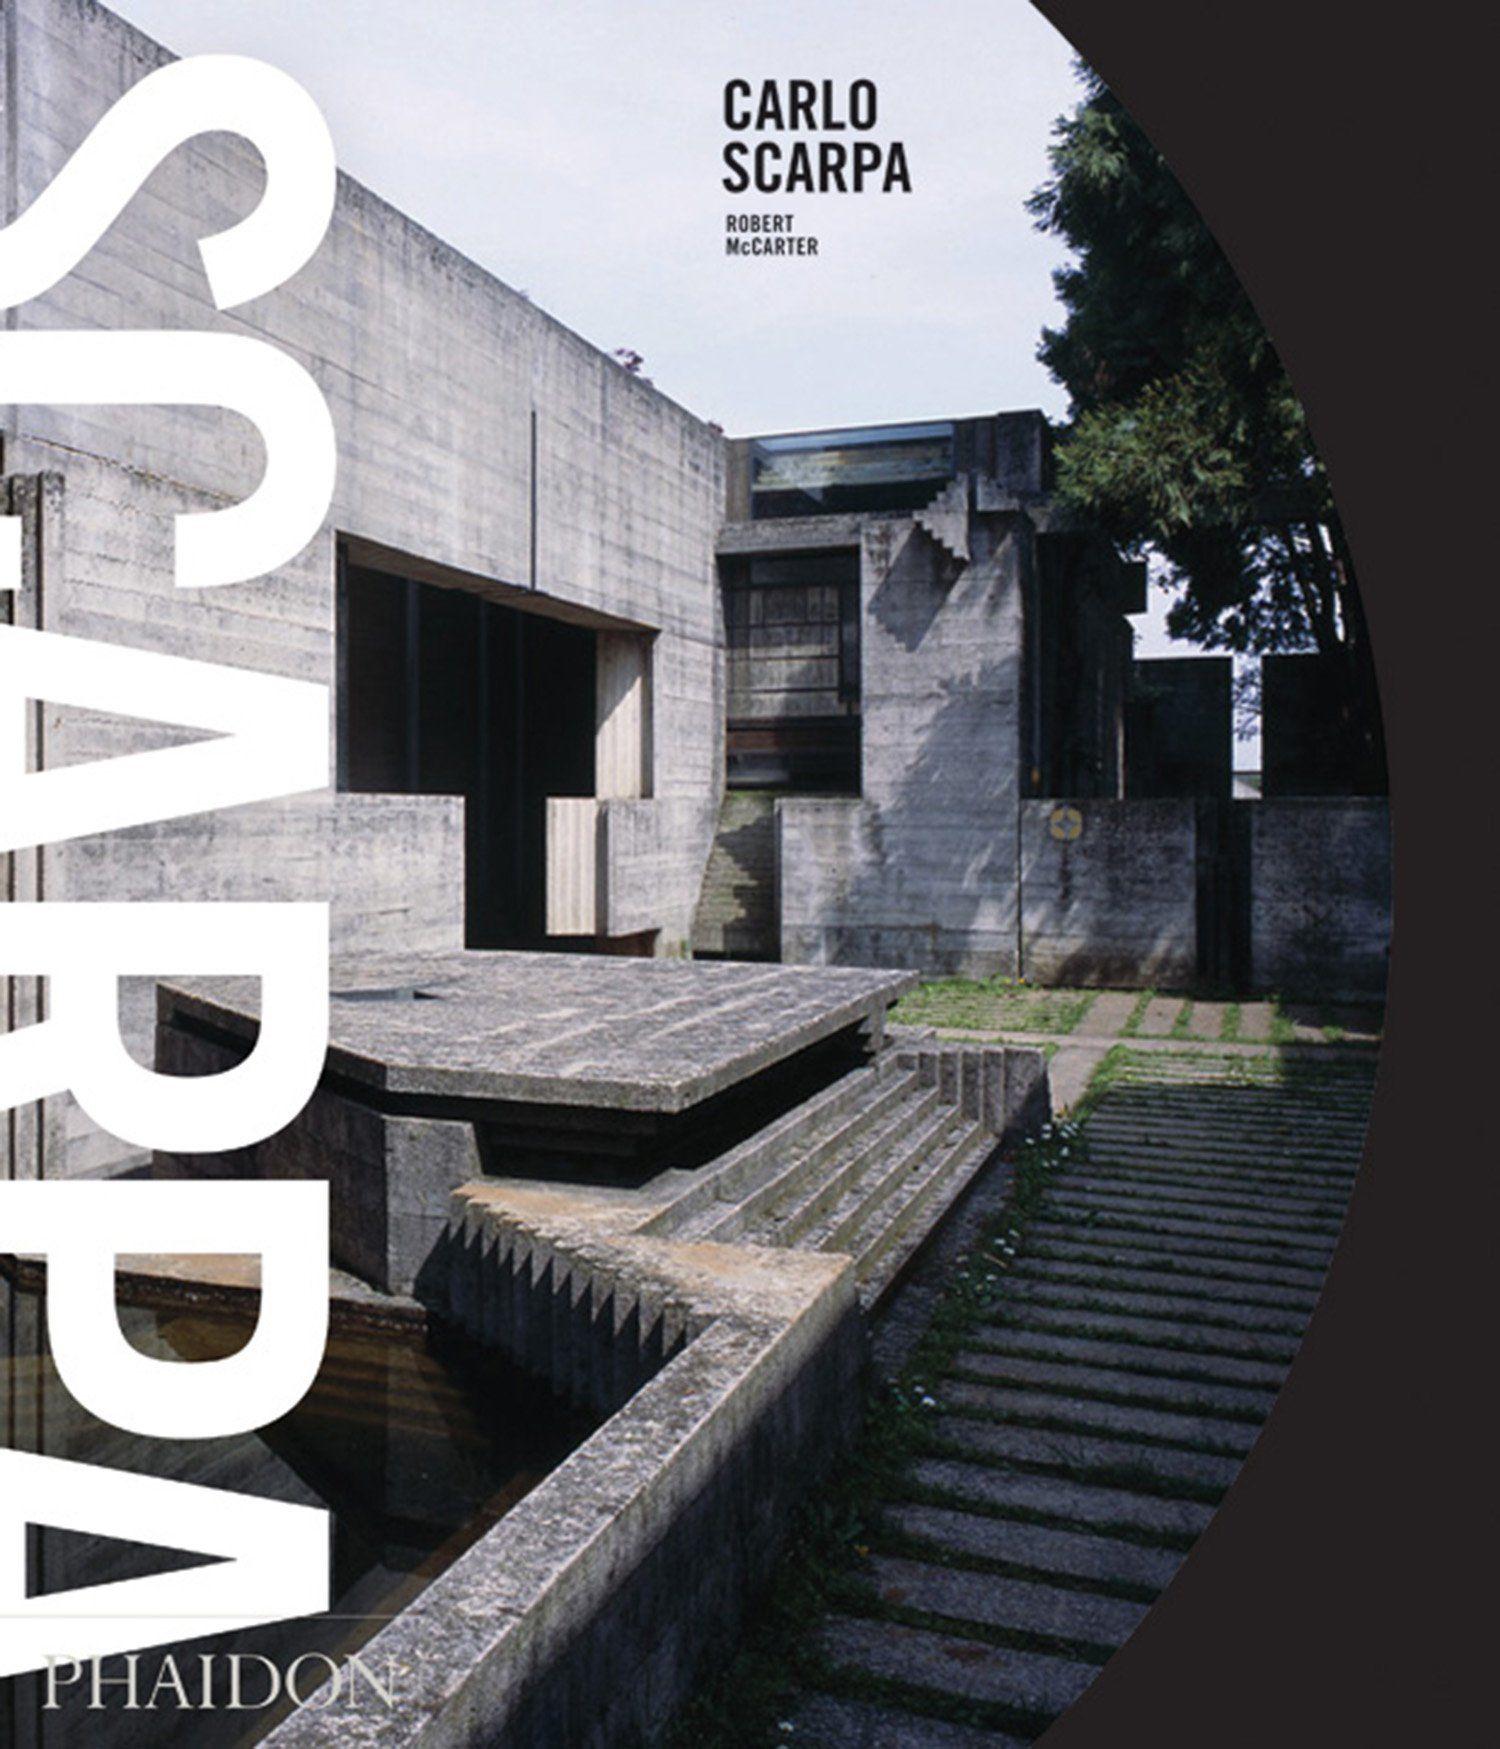 Robert McCarter. Carlo Scarpa 2013